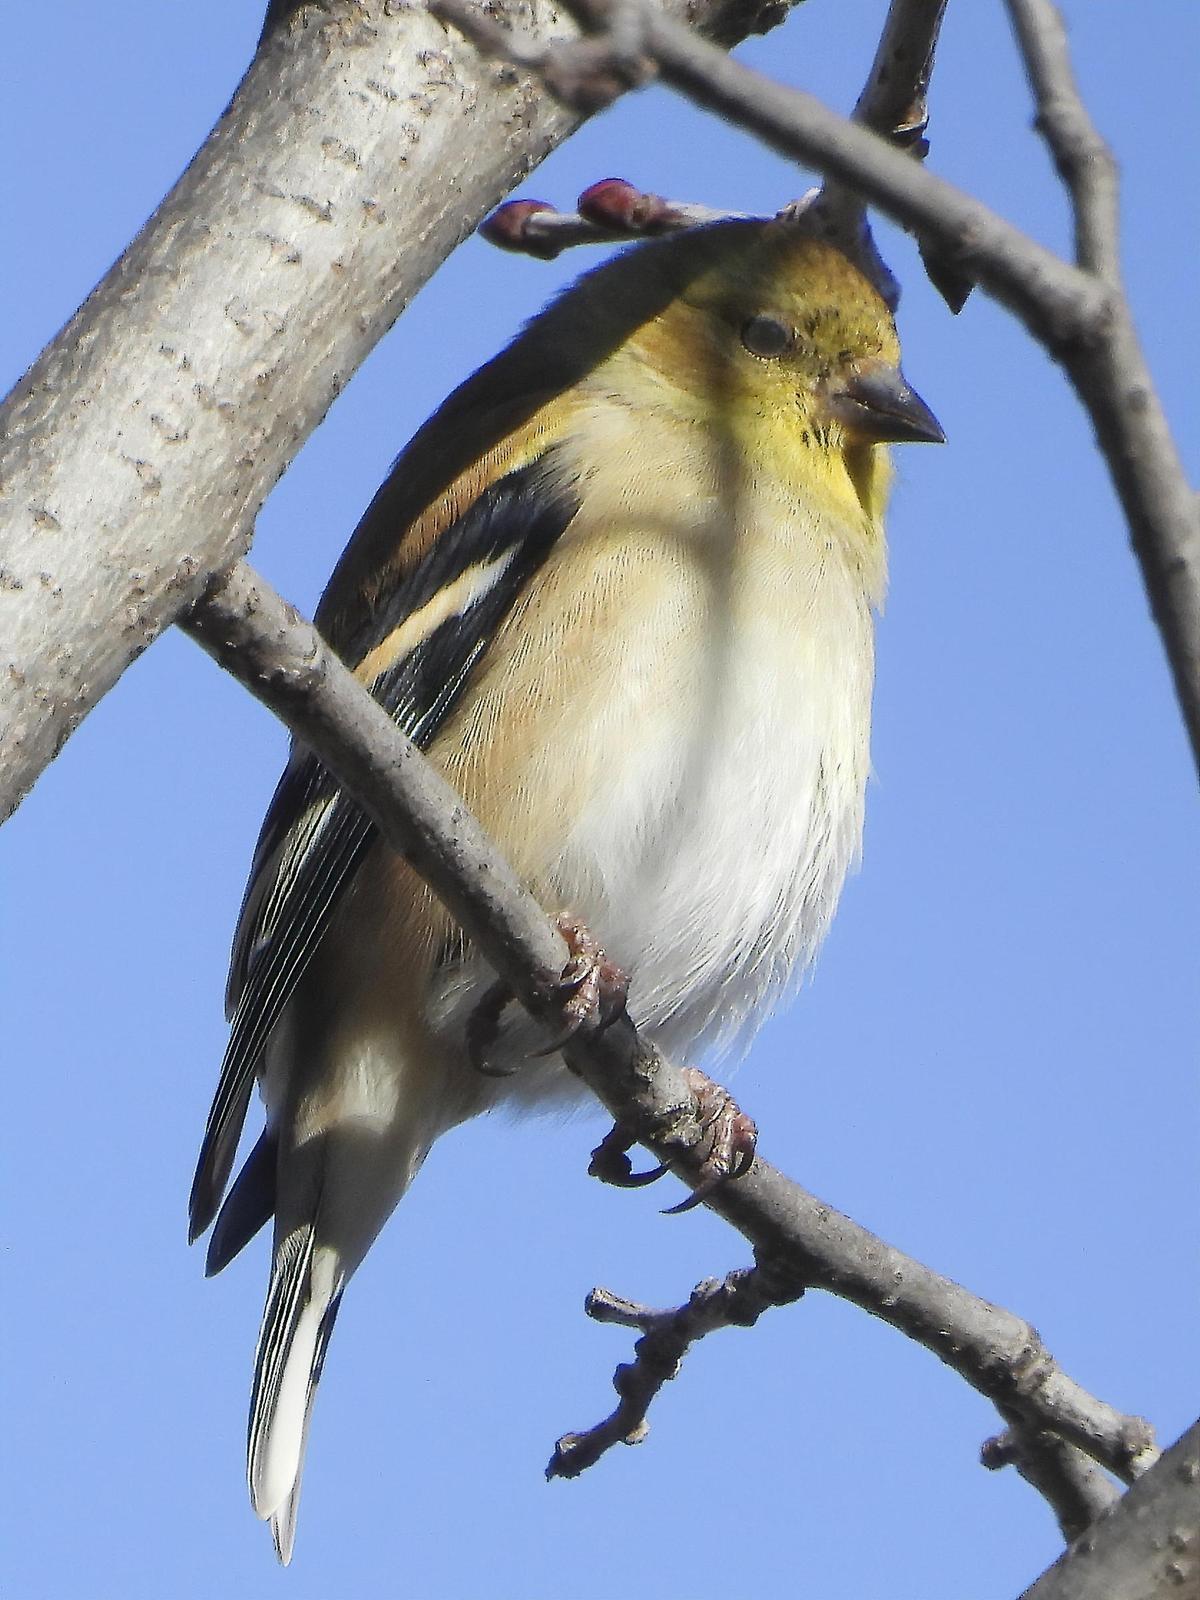 American Goldfinch Photo by Dan Tallman